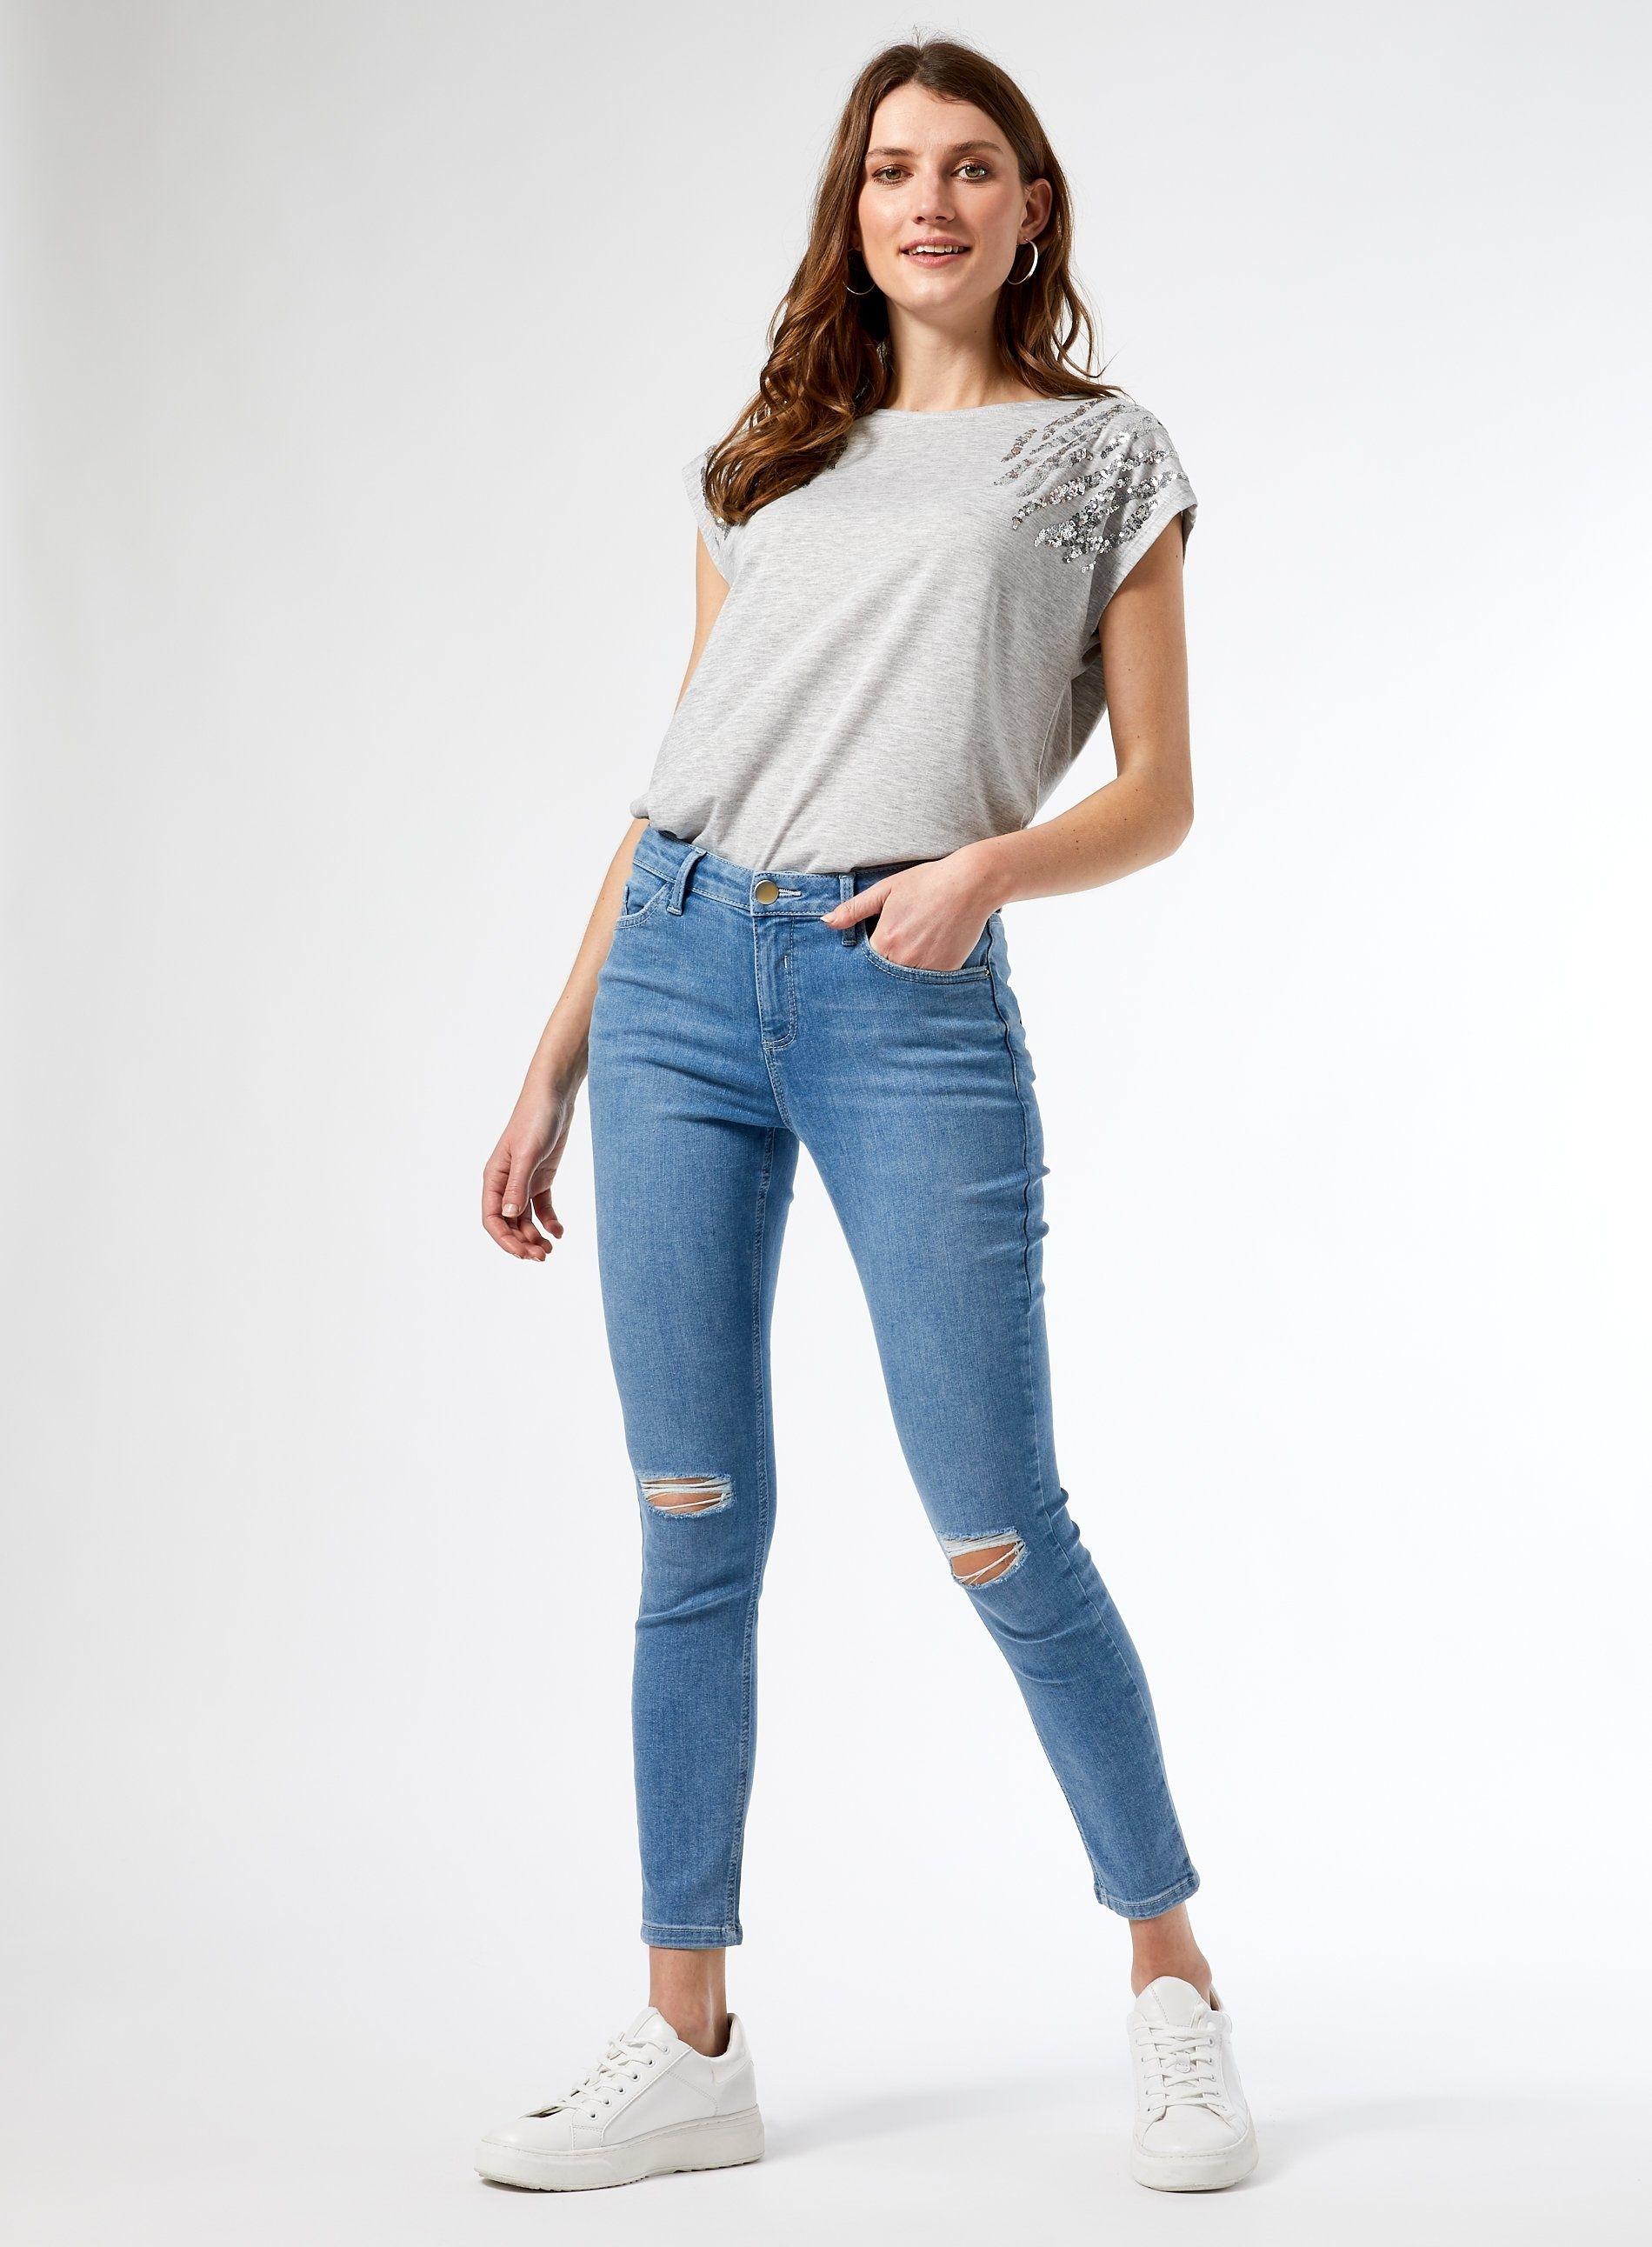 Dorothy Perkins Womens Blue Light Wash Darcy Rip Denim Jeans Cotton Skinny Pants